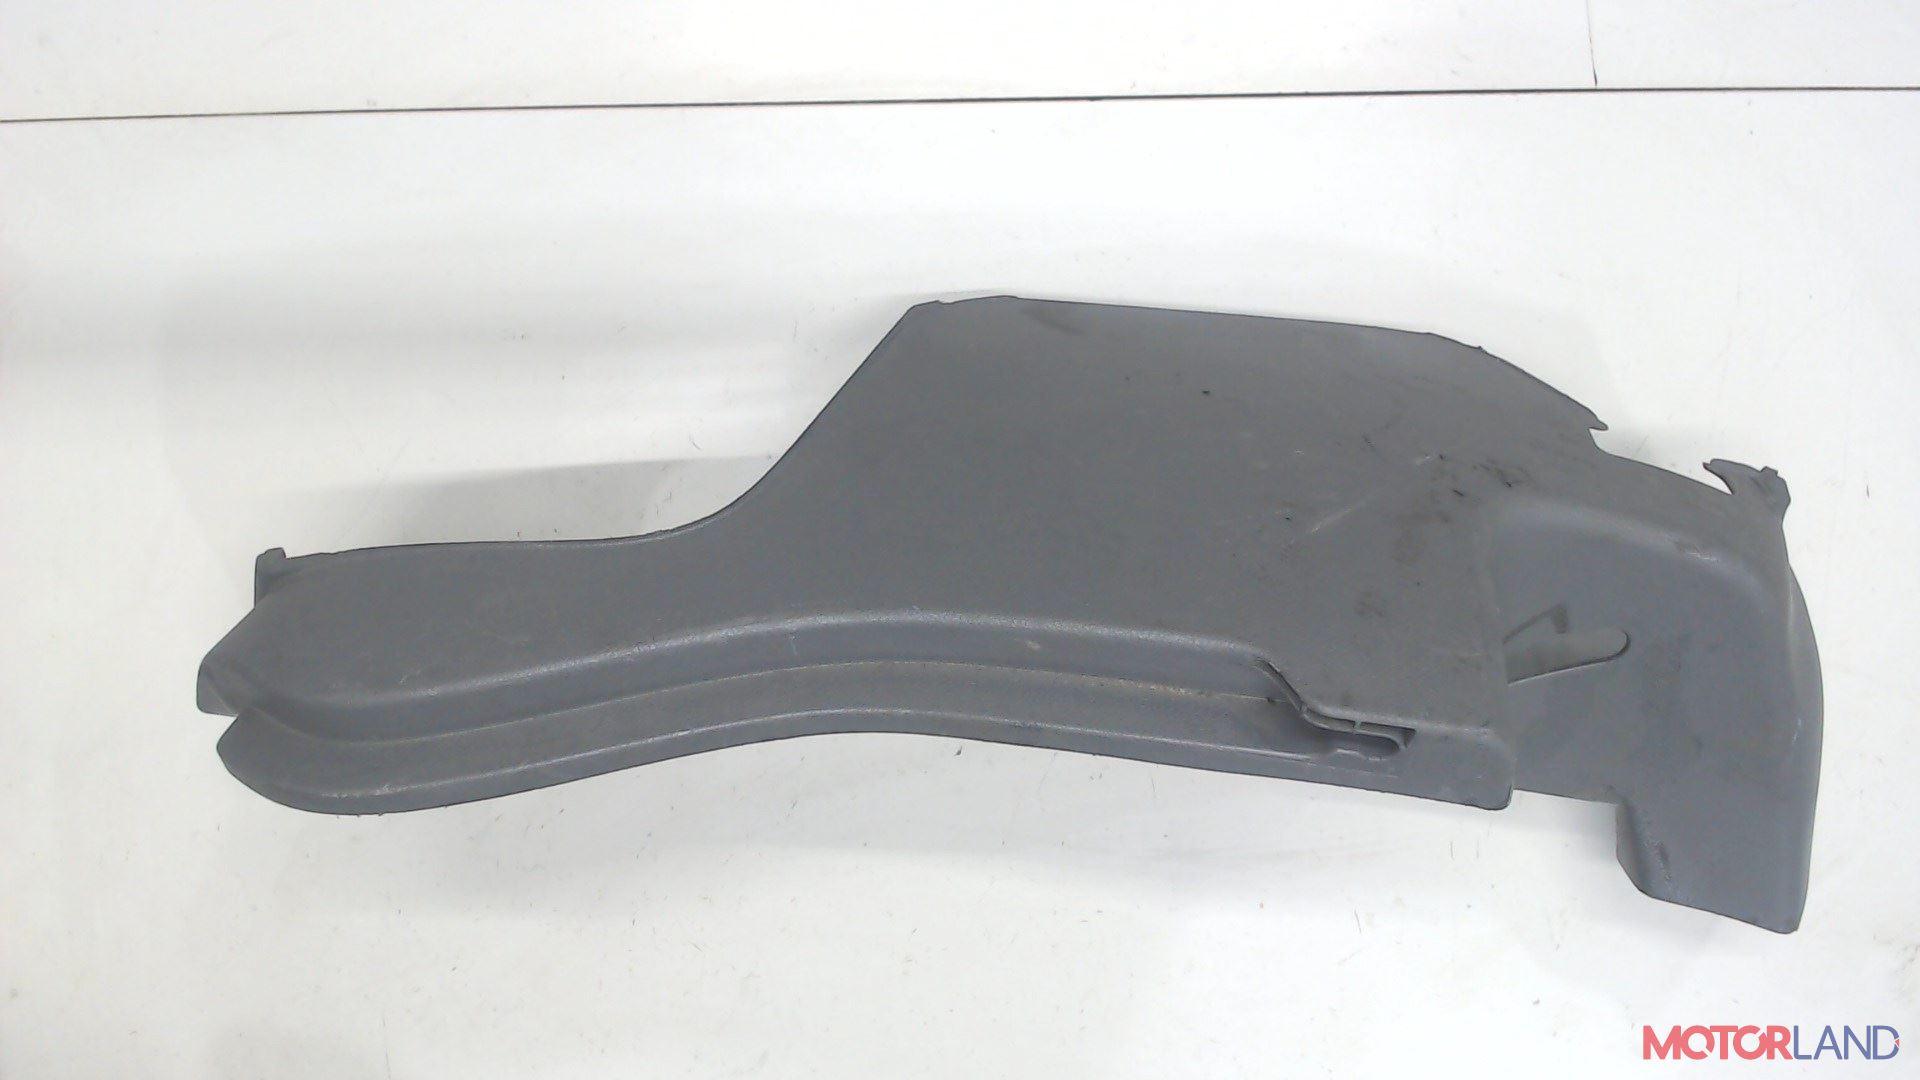 Пластик (обшивка) багажника Ford Fusion 2002-2012 1.4 л. 2002 FXJA, FXJB, FXJC б/у #1